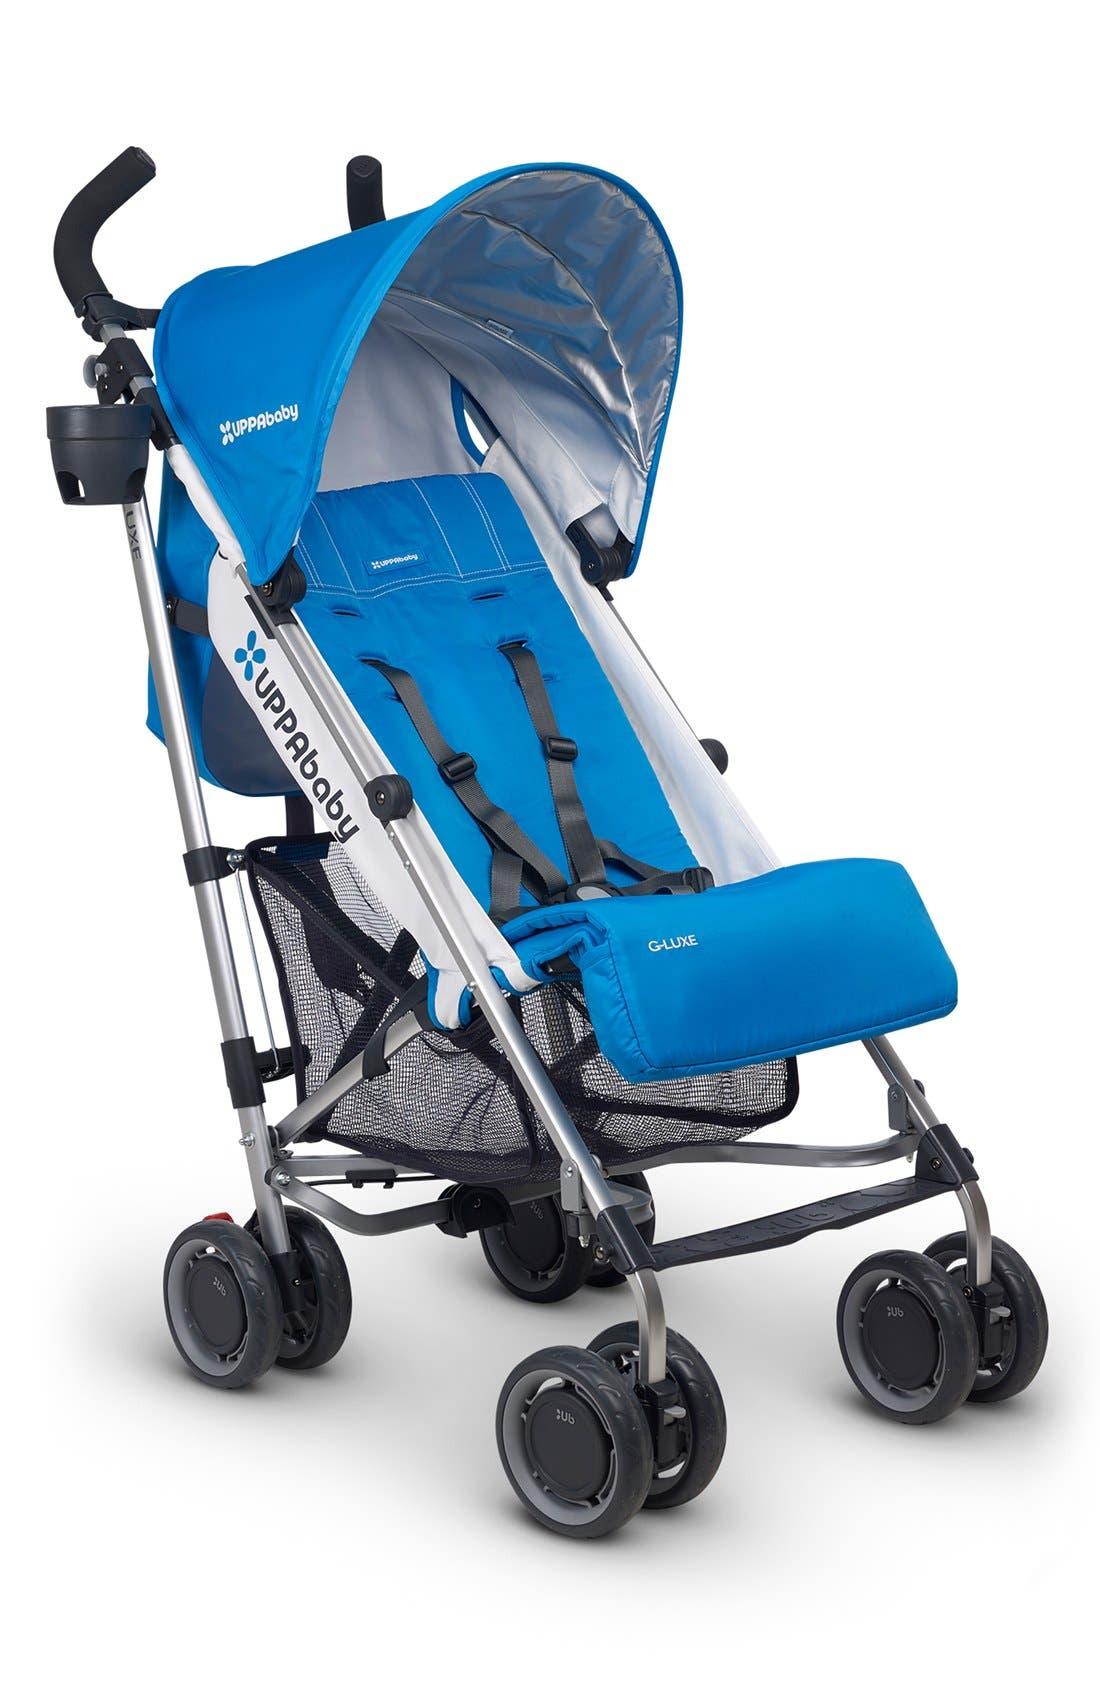 Main Image - UPPAbaby G-LUXE Geo Aluminum Frame Reclining Umbrella Stroller